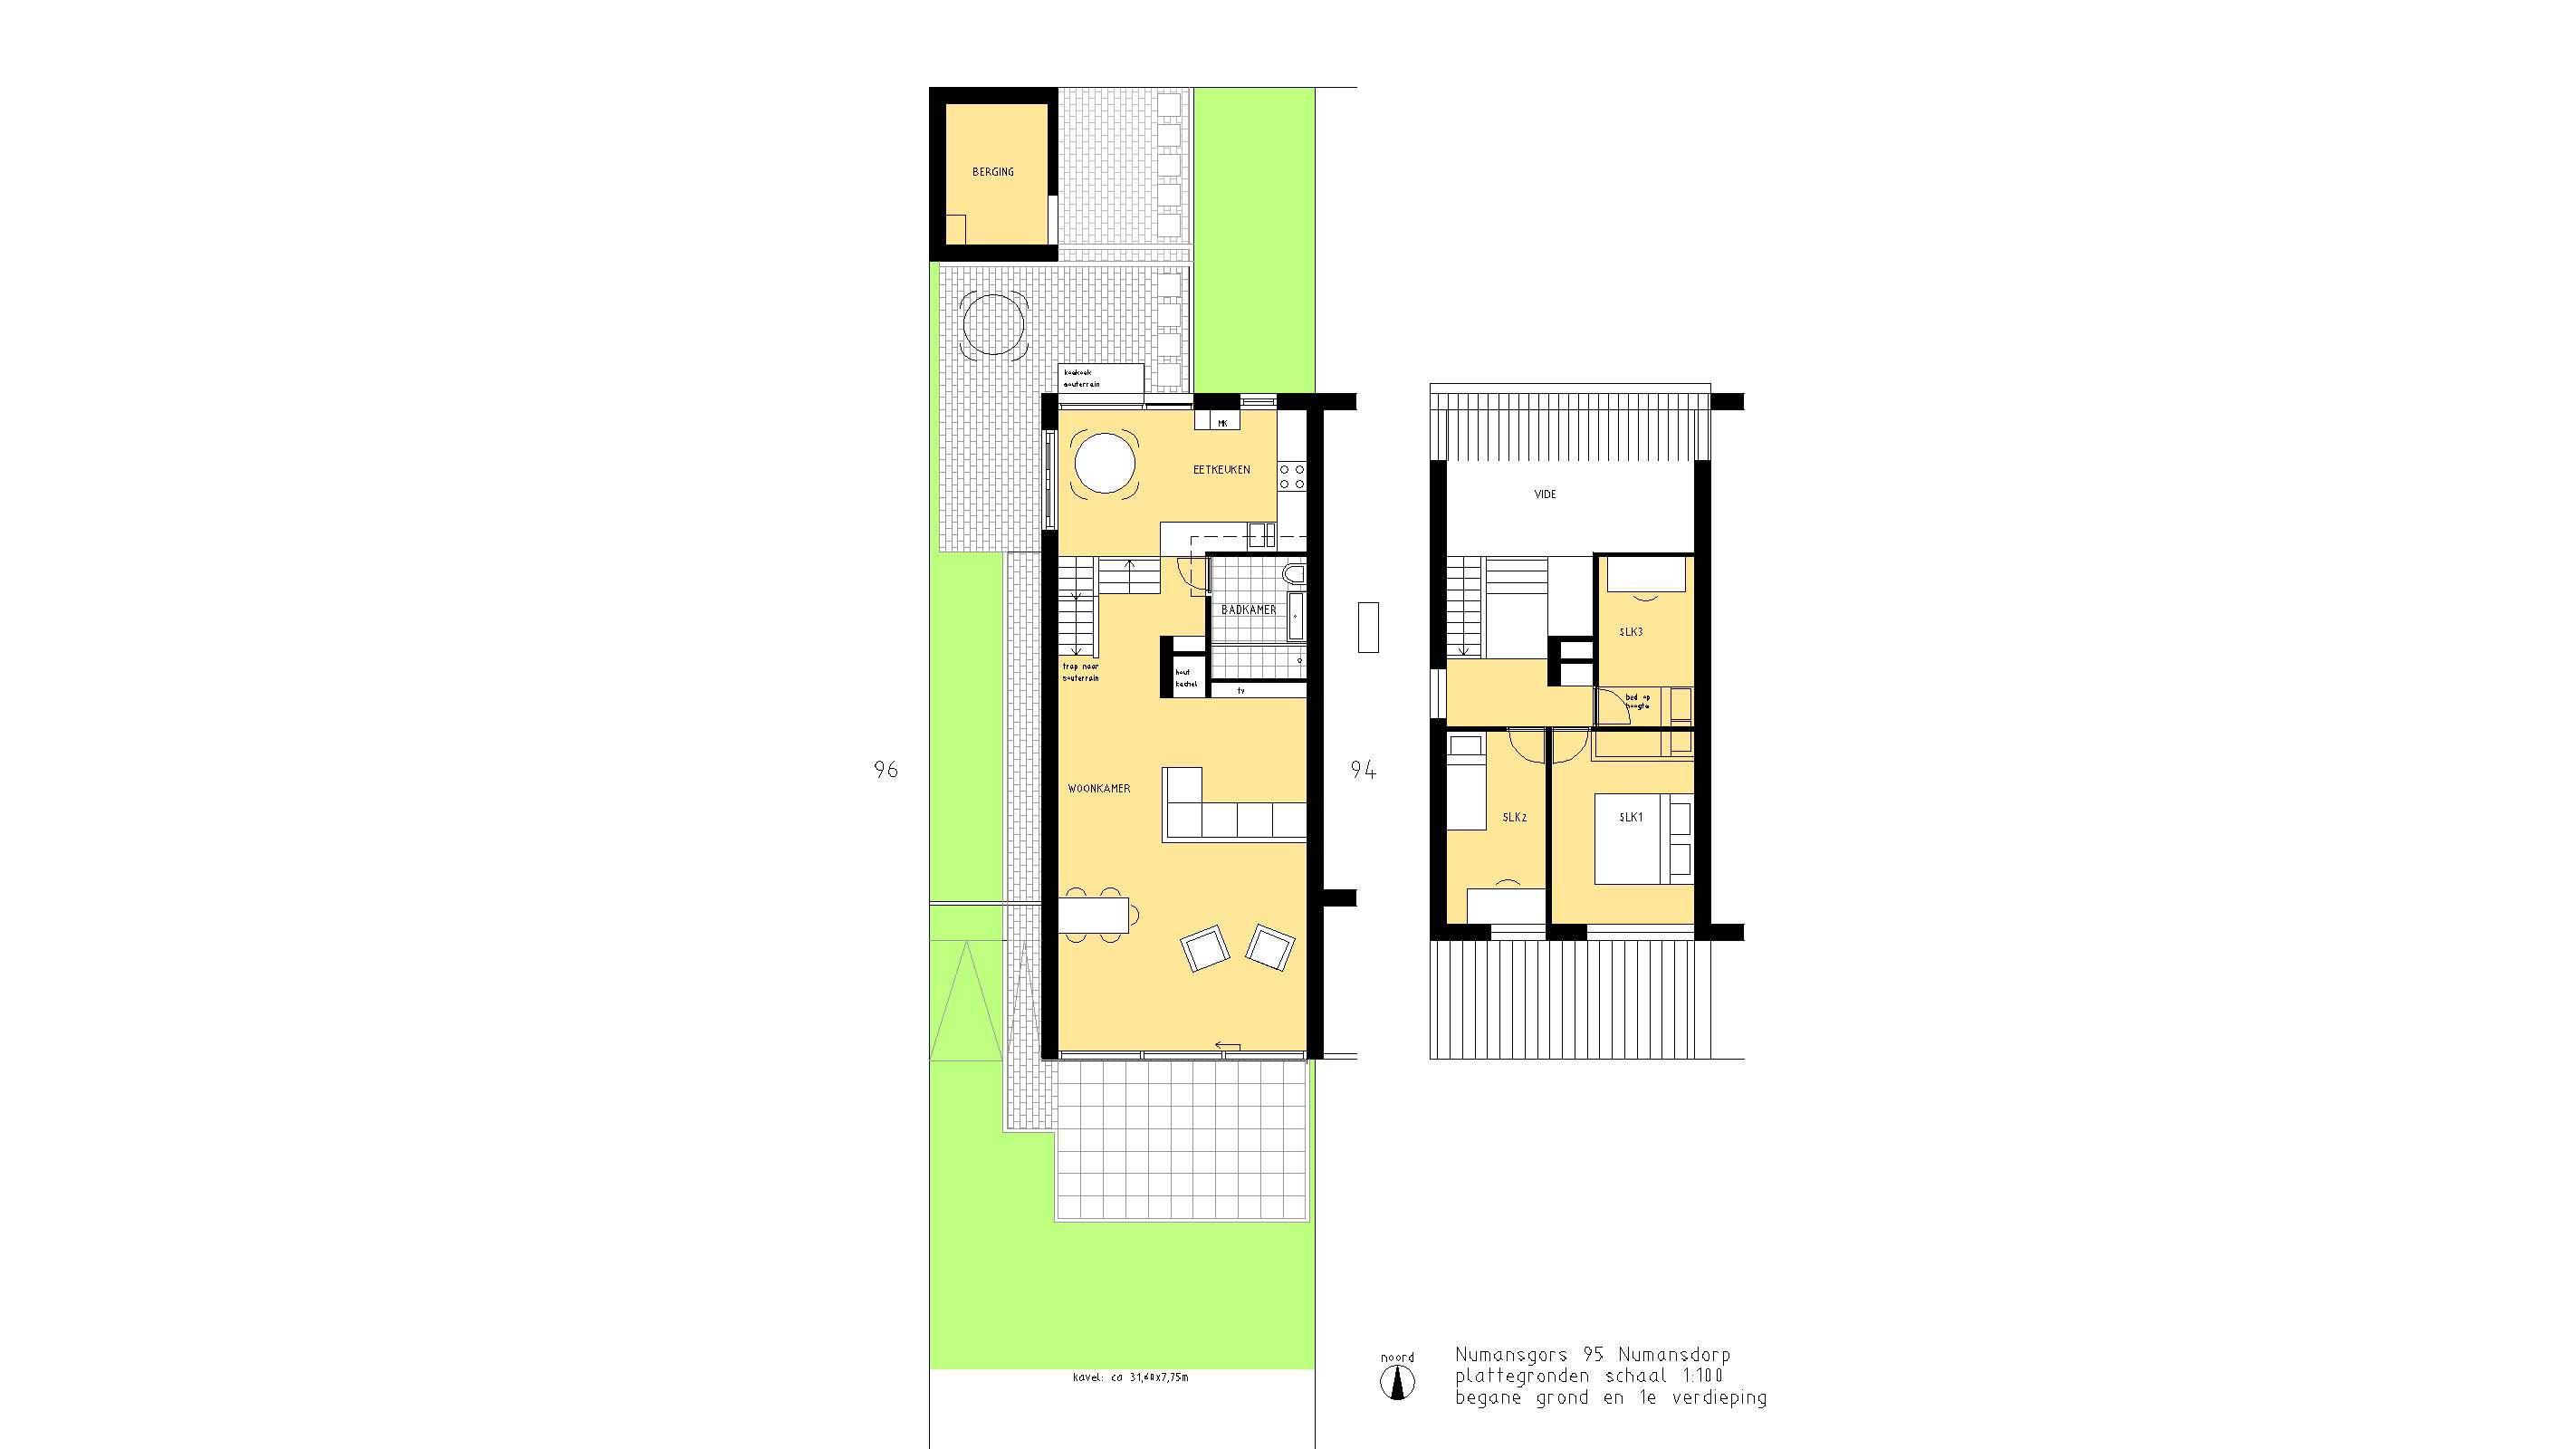 numansgors 95 numansdorp architect marja haring